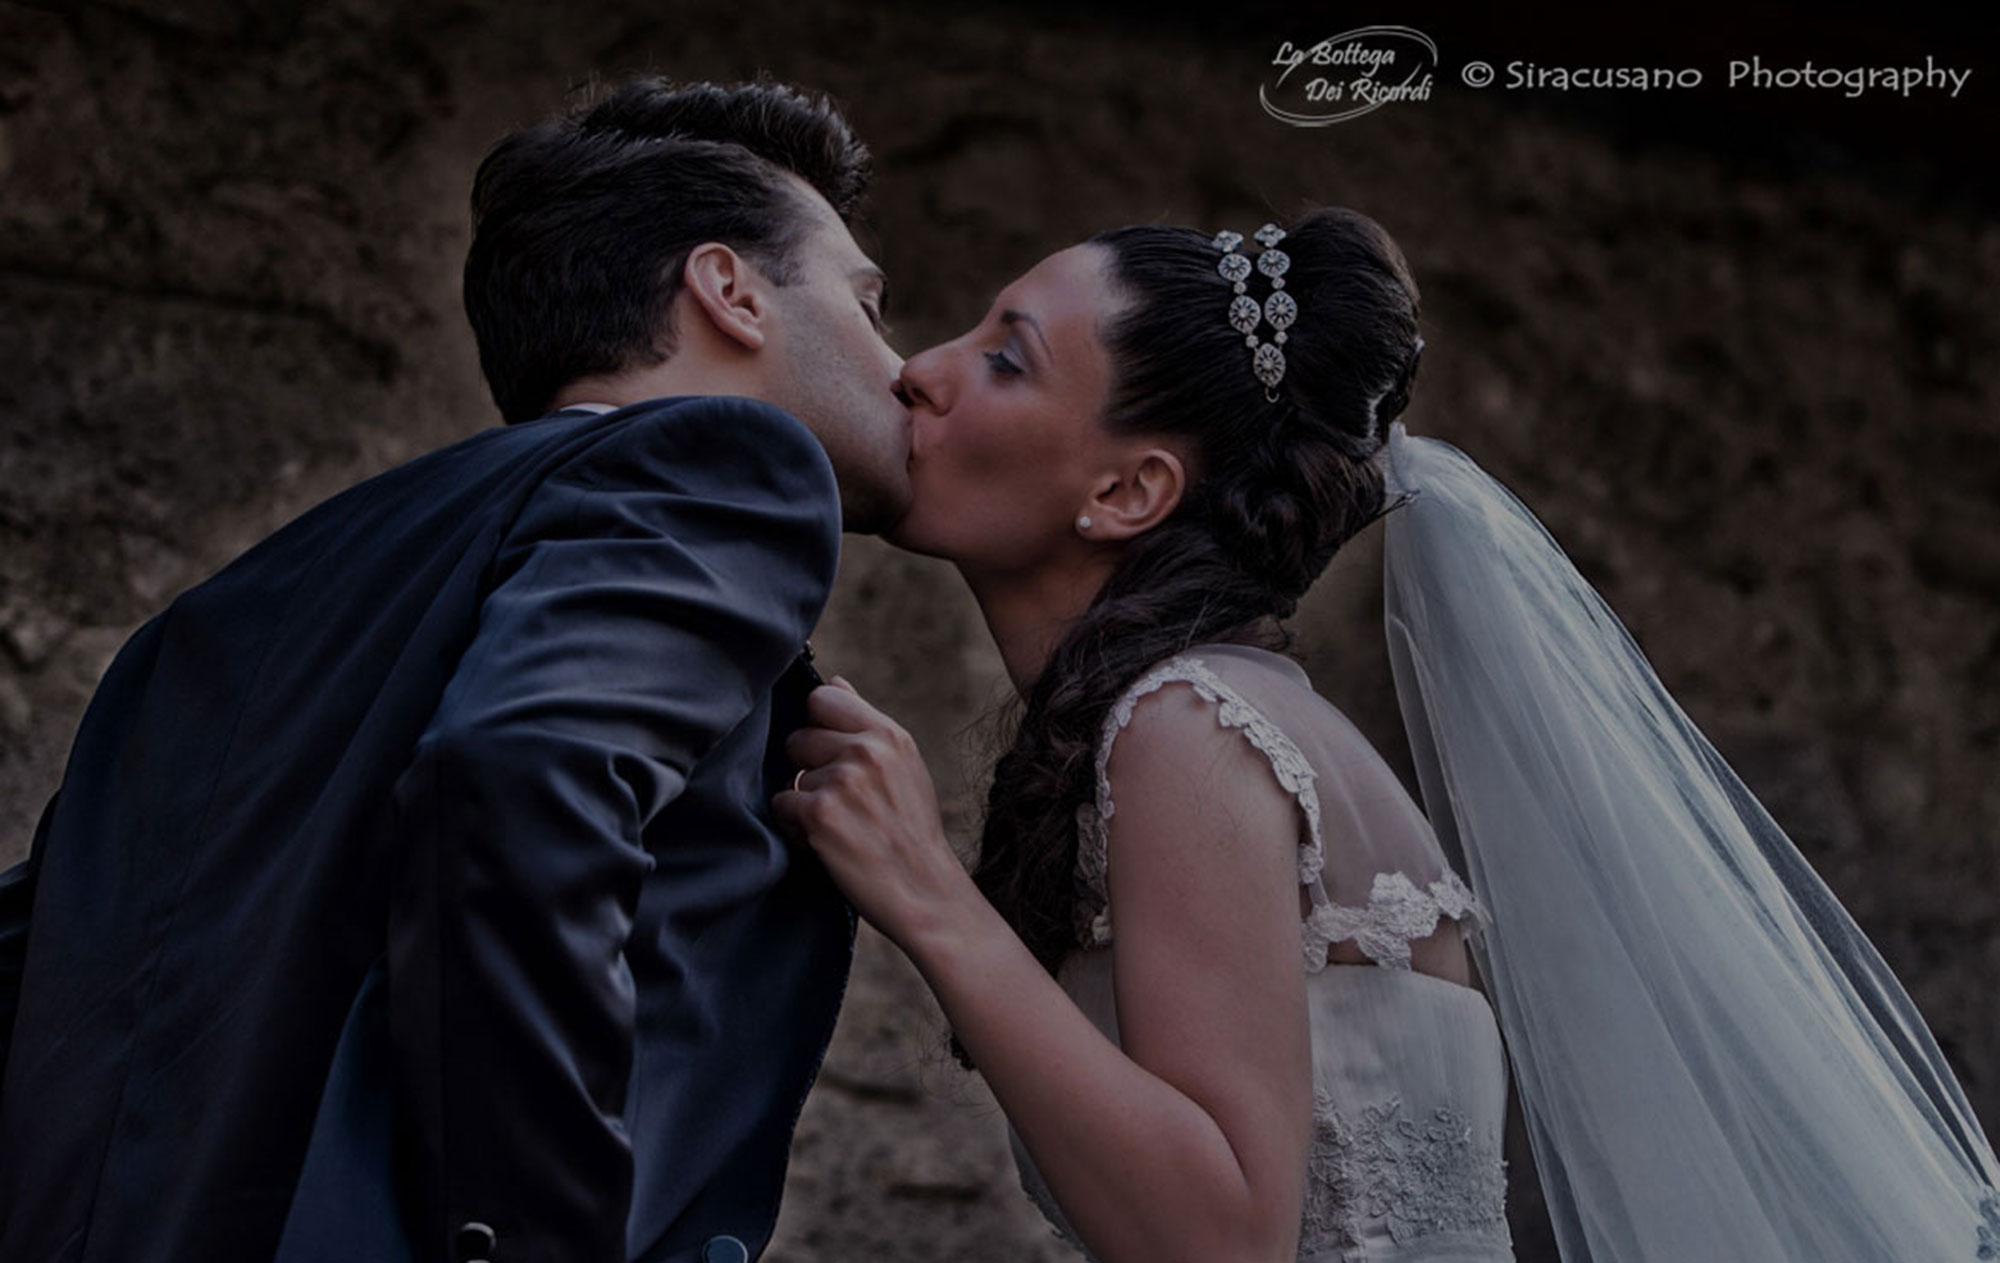 Fotografo Matrimonio La Bottega dei Ricordi Messina - Matrimonio Enzo e Oriana